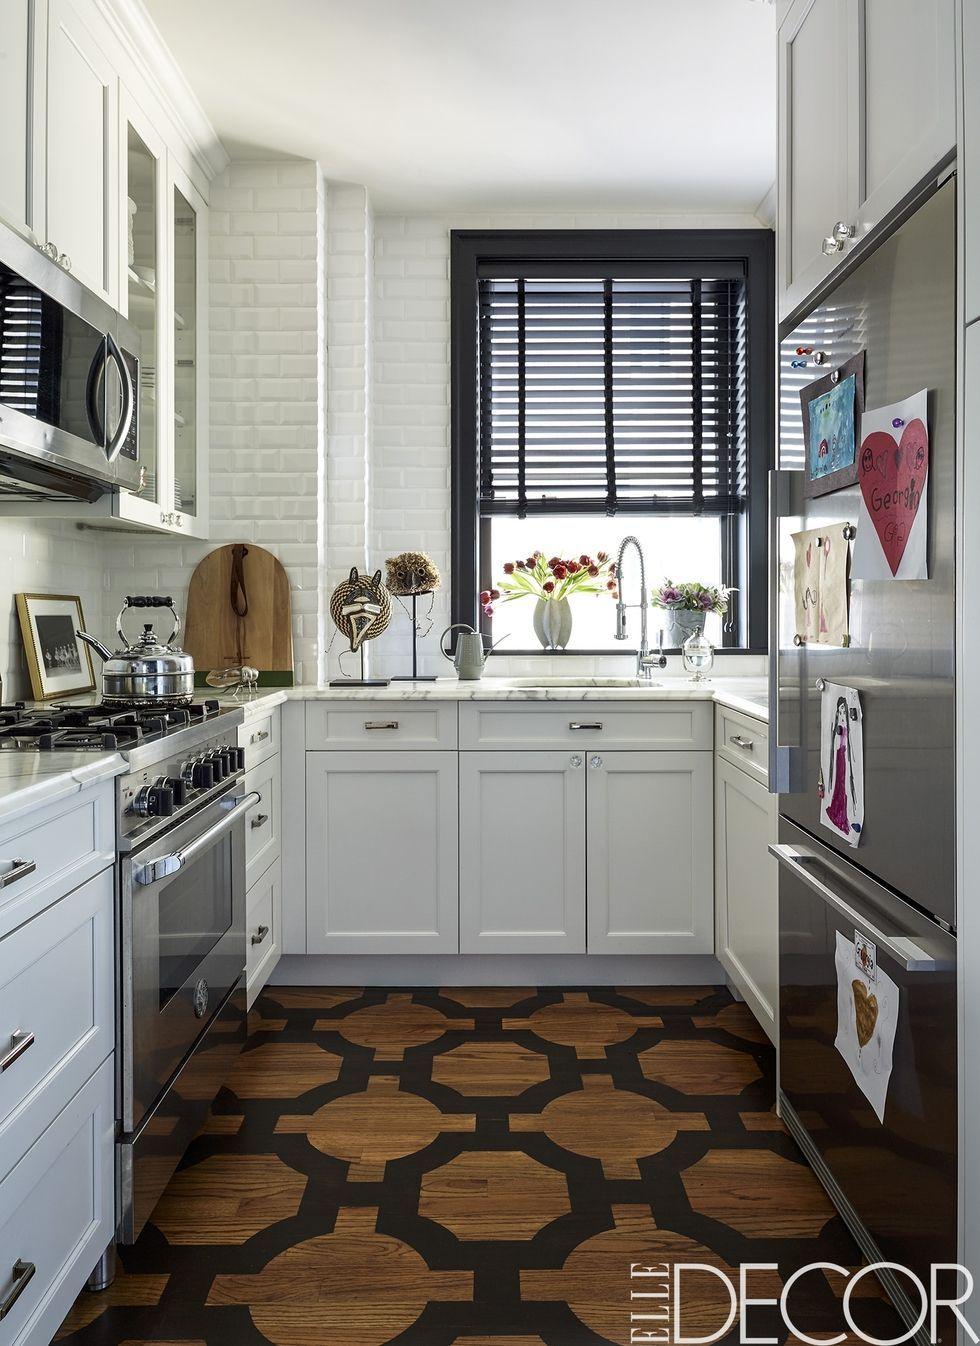 Small kitchen interior design photos for Small kitchen interior